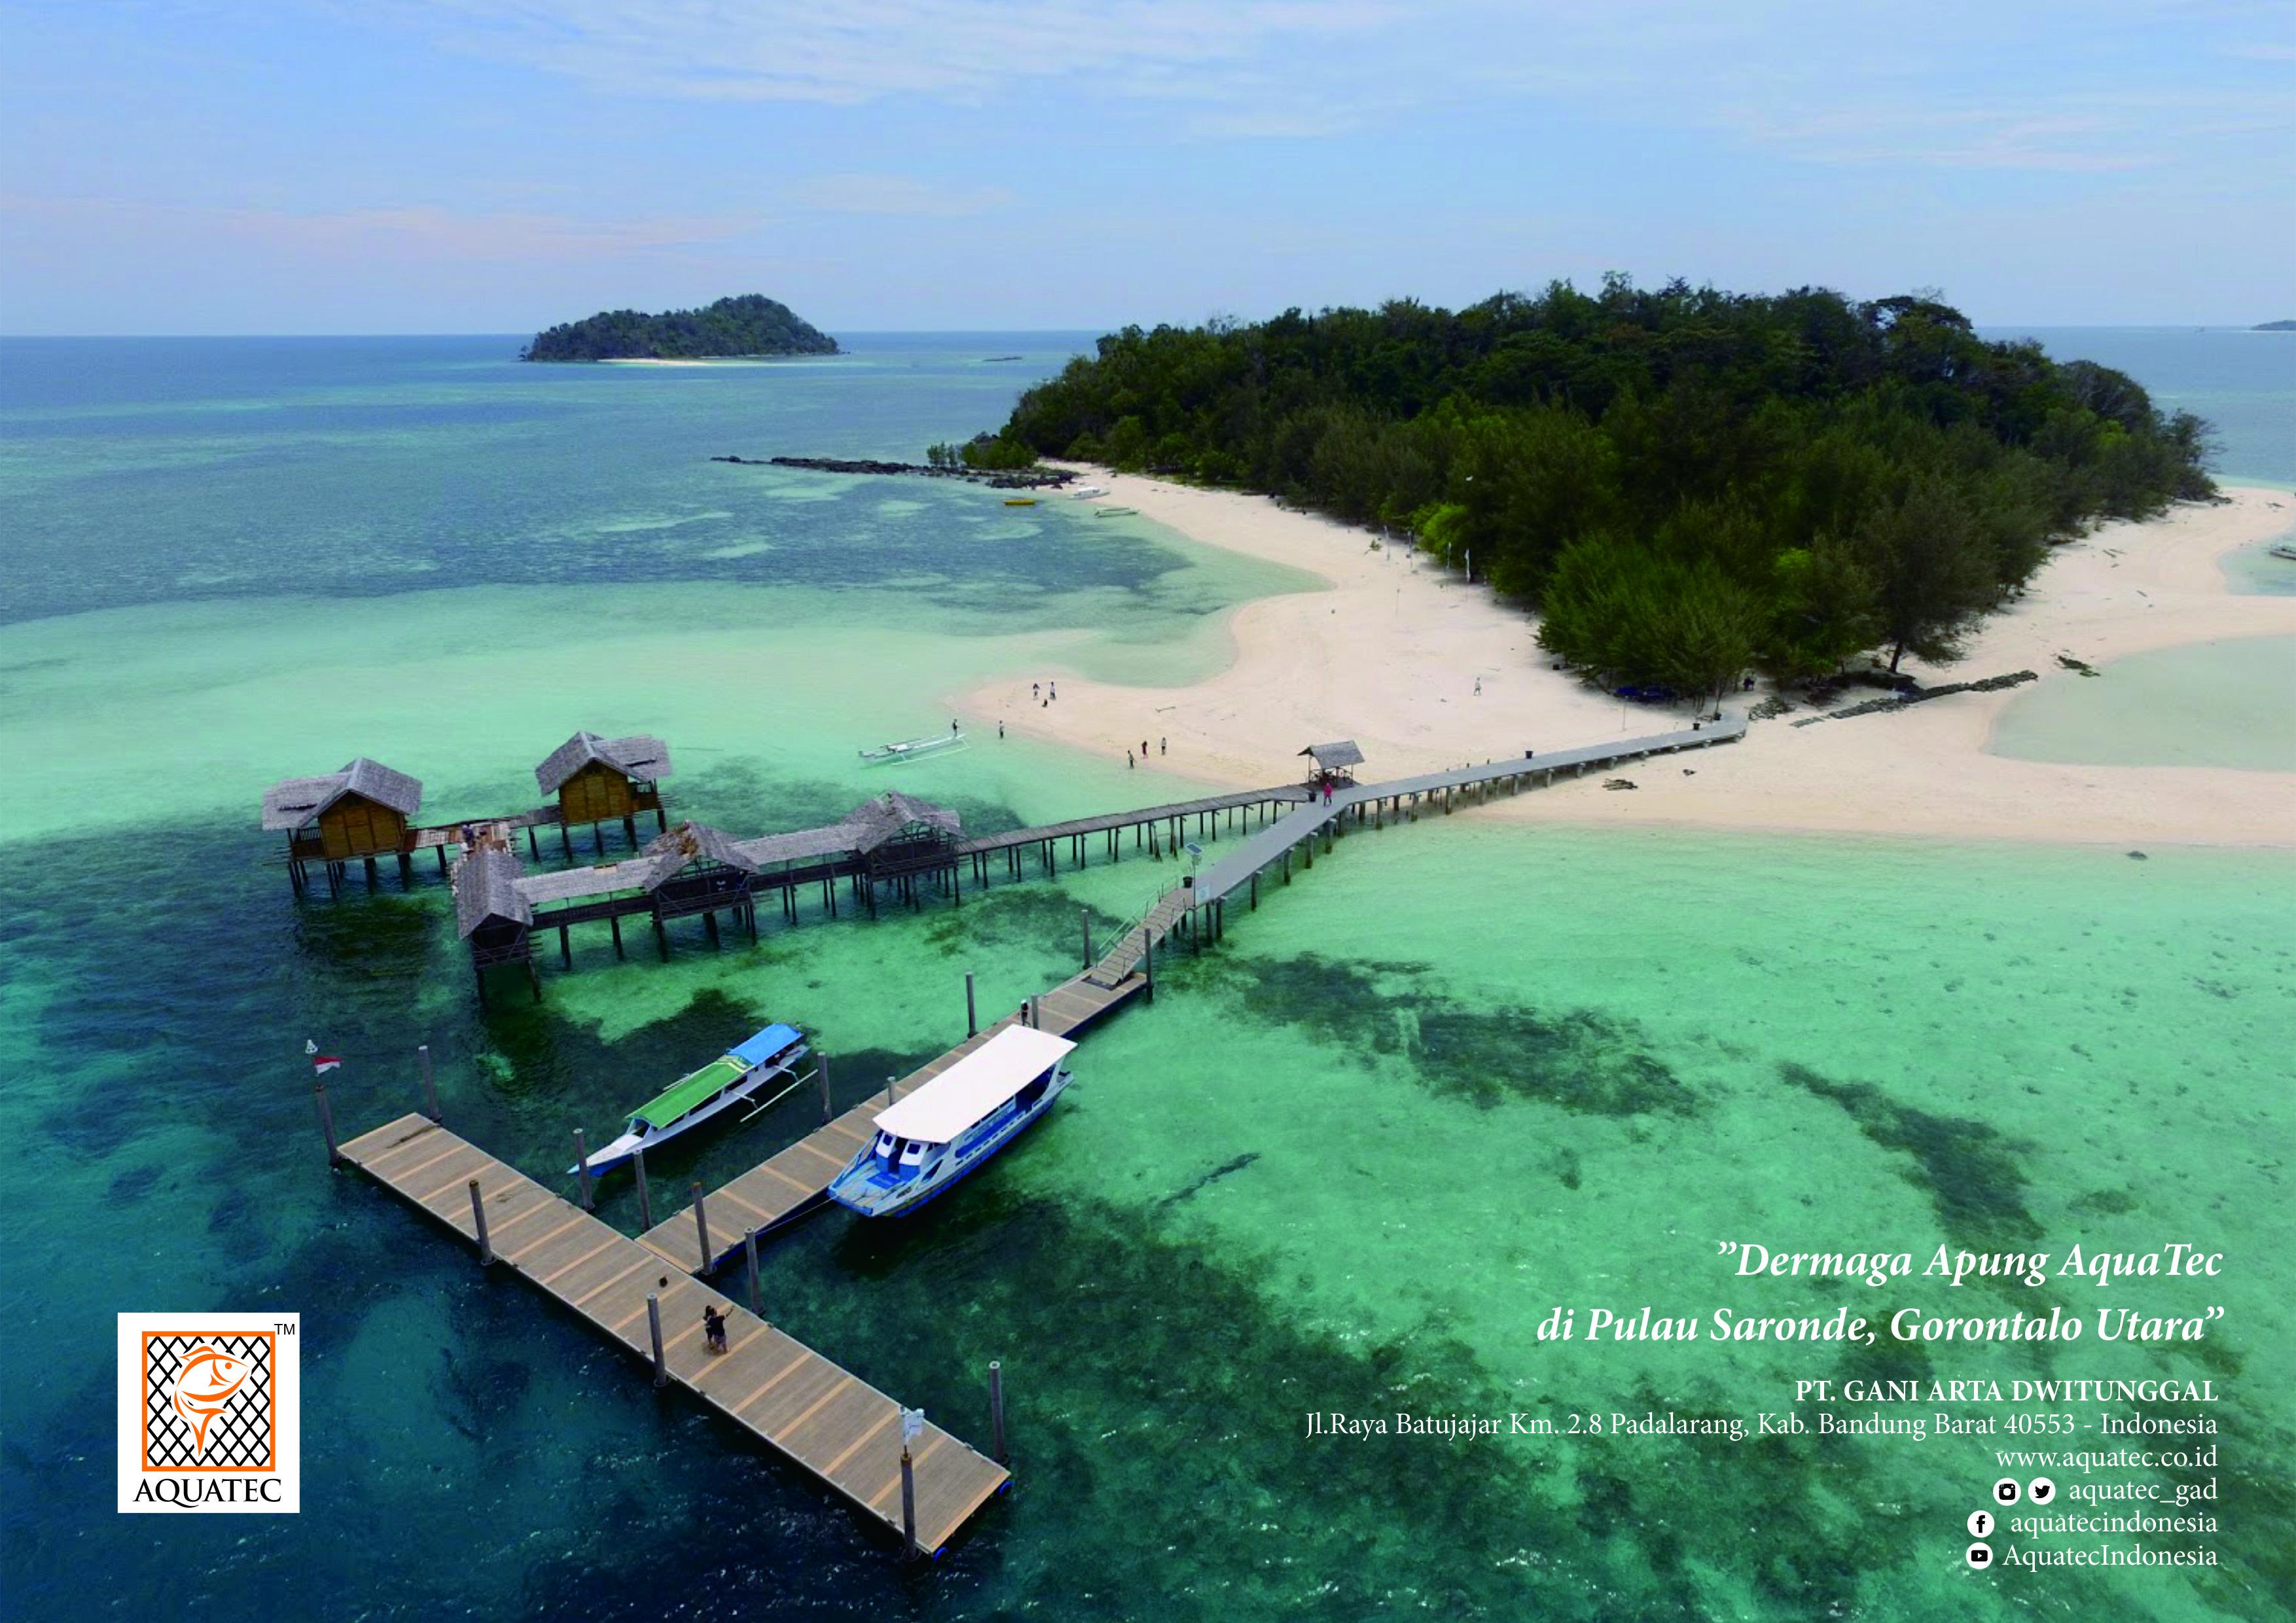 Pesona Dermaga Apung Aquatec Pulau Saronde Gorontalo Utara Kab